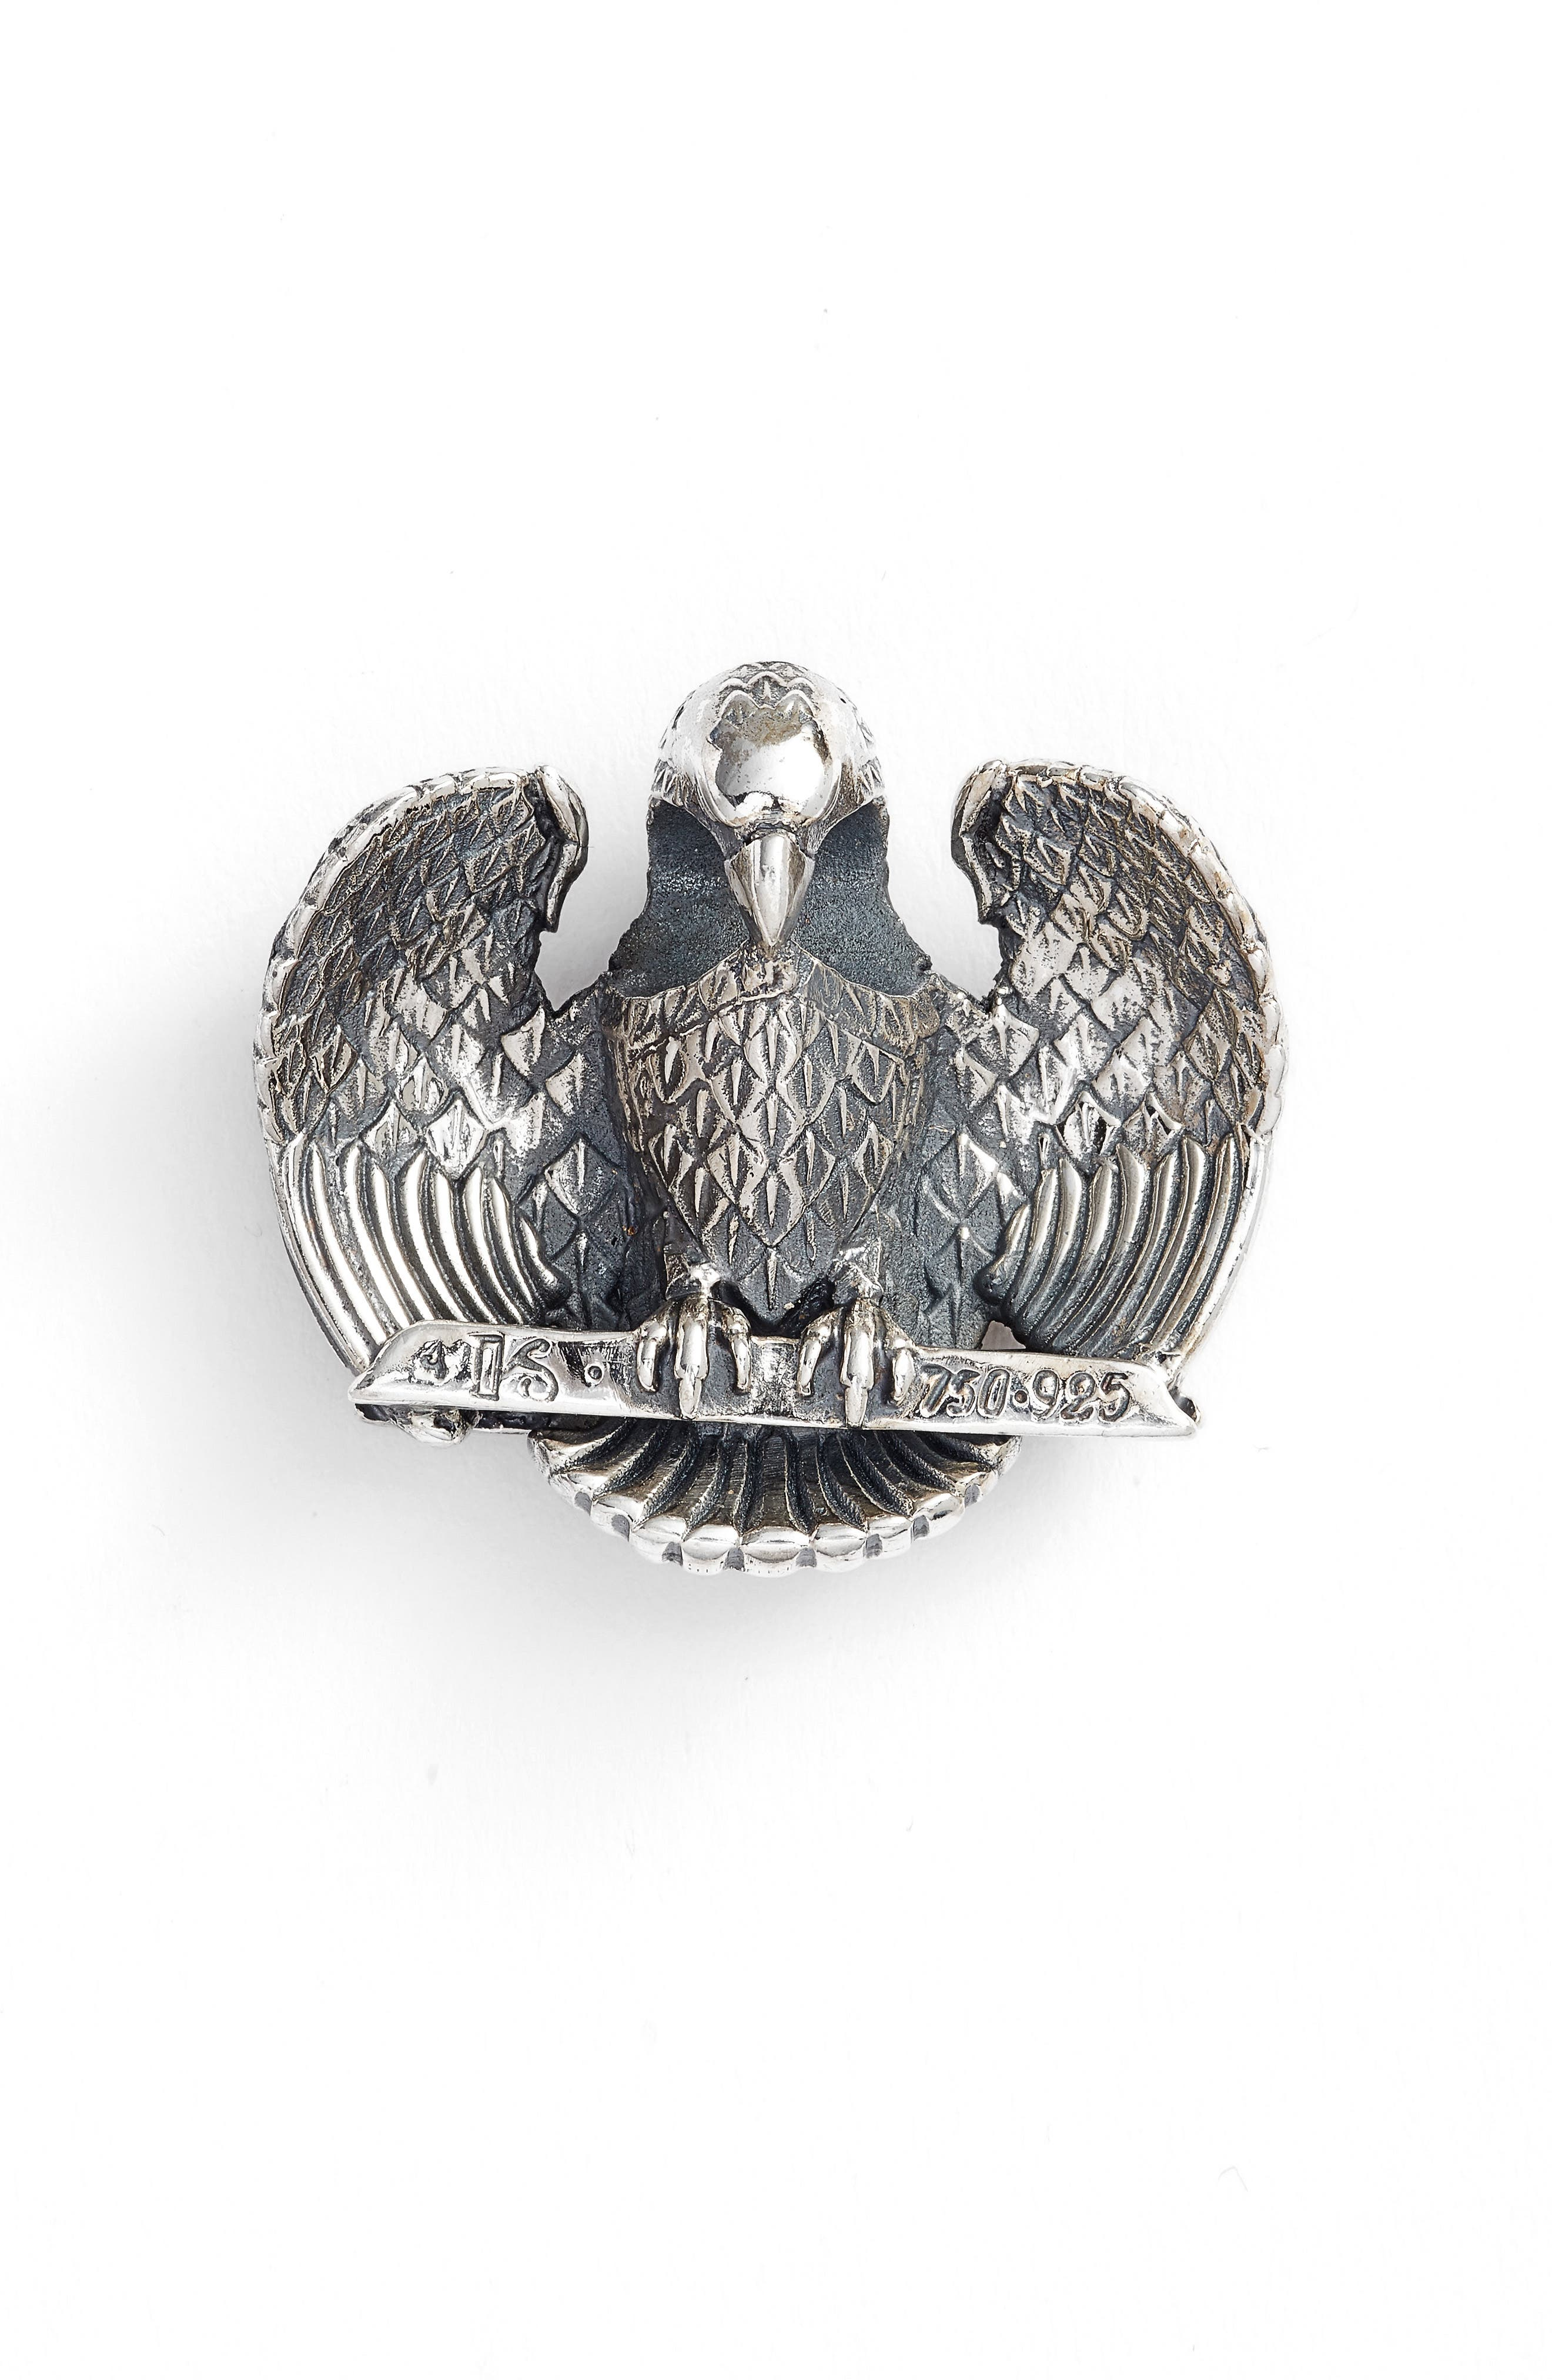 Heonos Two-Tone Eagle Pendant,                             Main thumbnail 1, color,                             Silver/ Gold